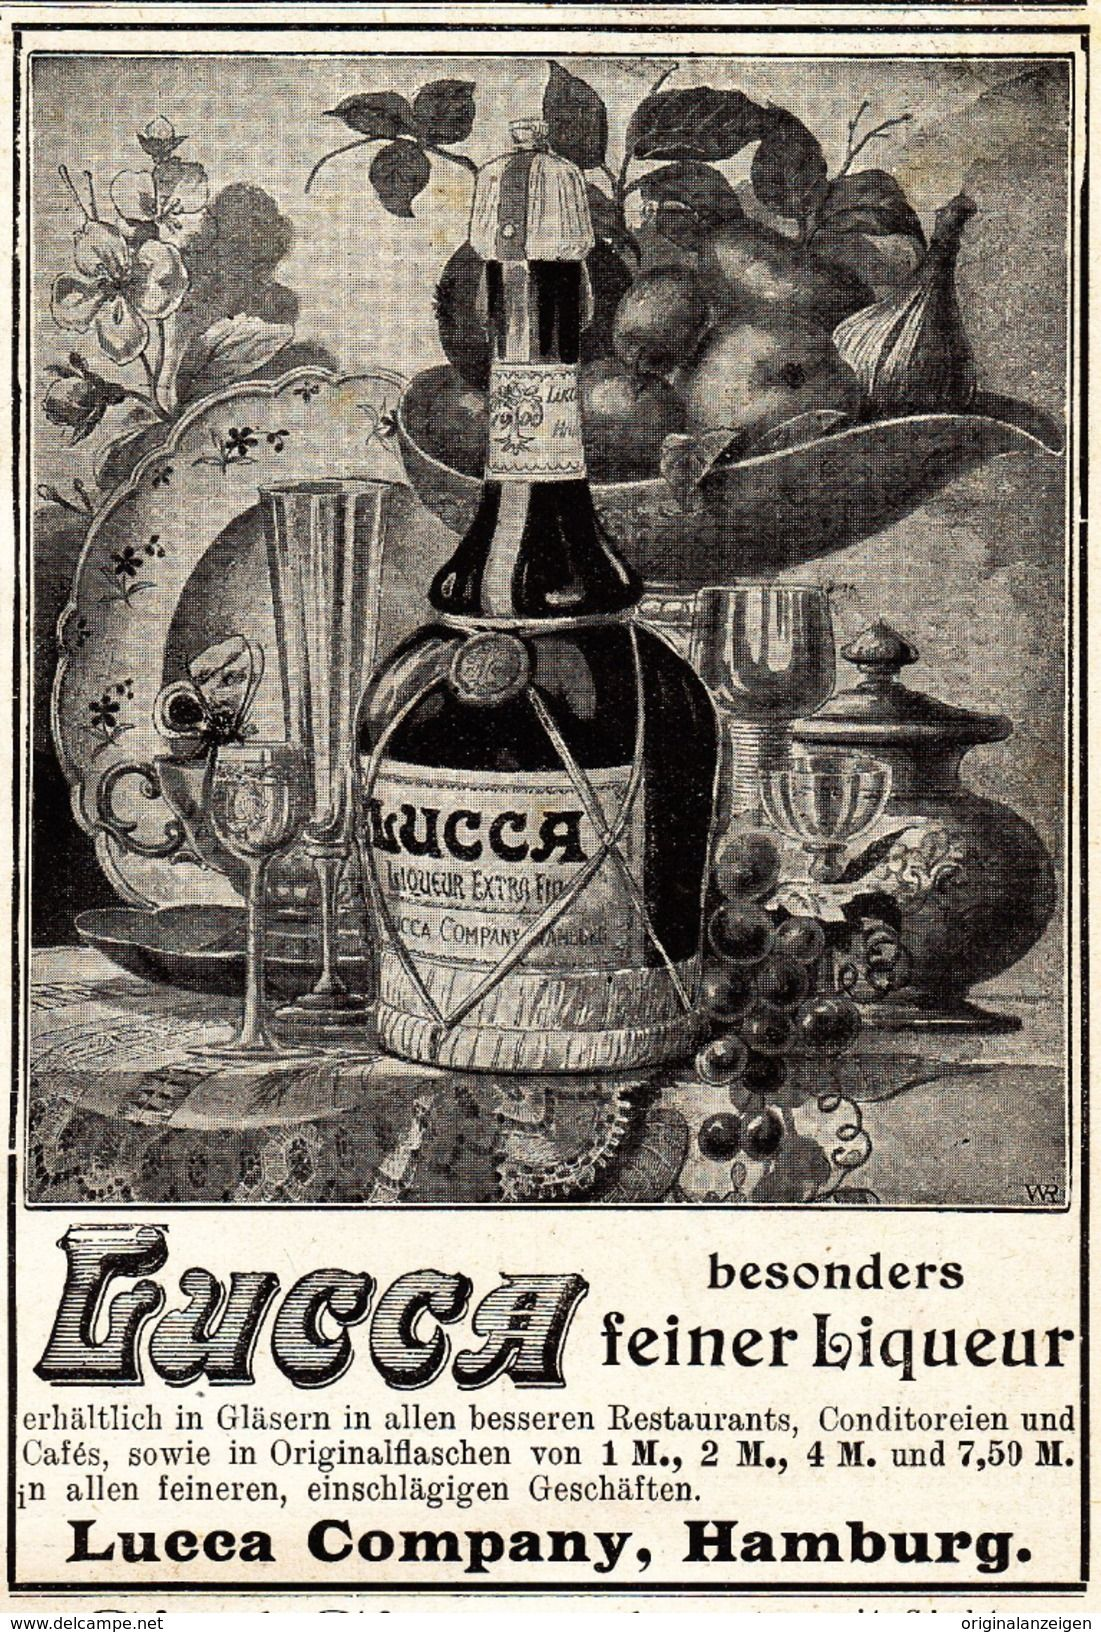 Werbung - Original-Werbung/ Anzeige 1901 - LUCCA LIQUEUR - HAMBURG - ca. 90 x 130 mm